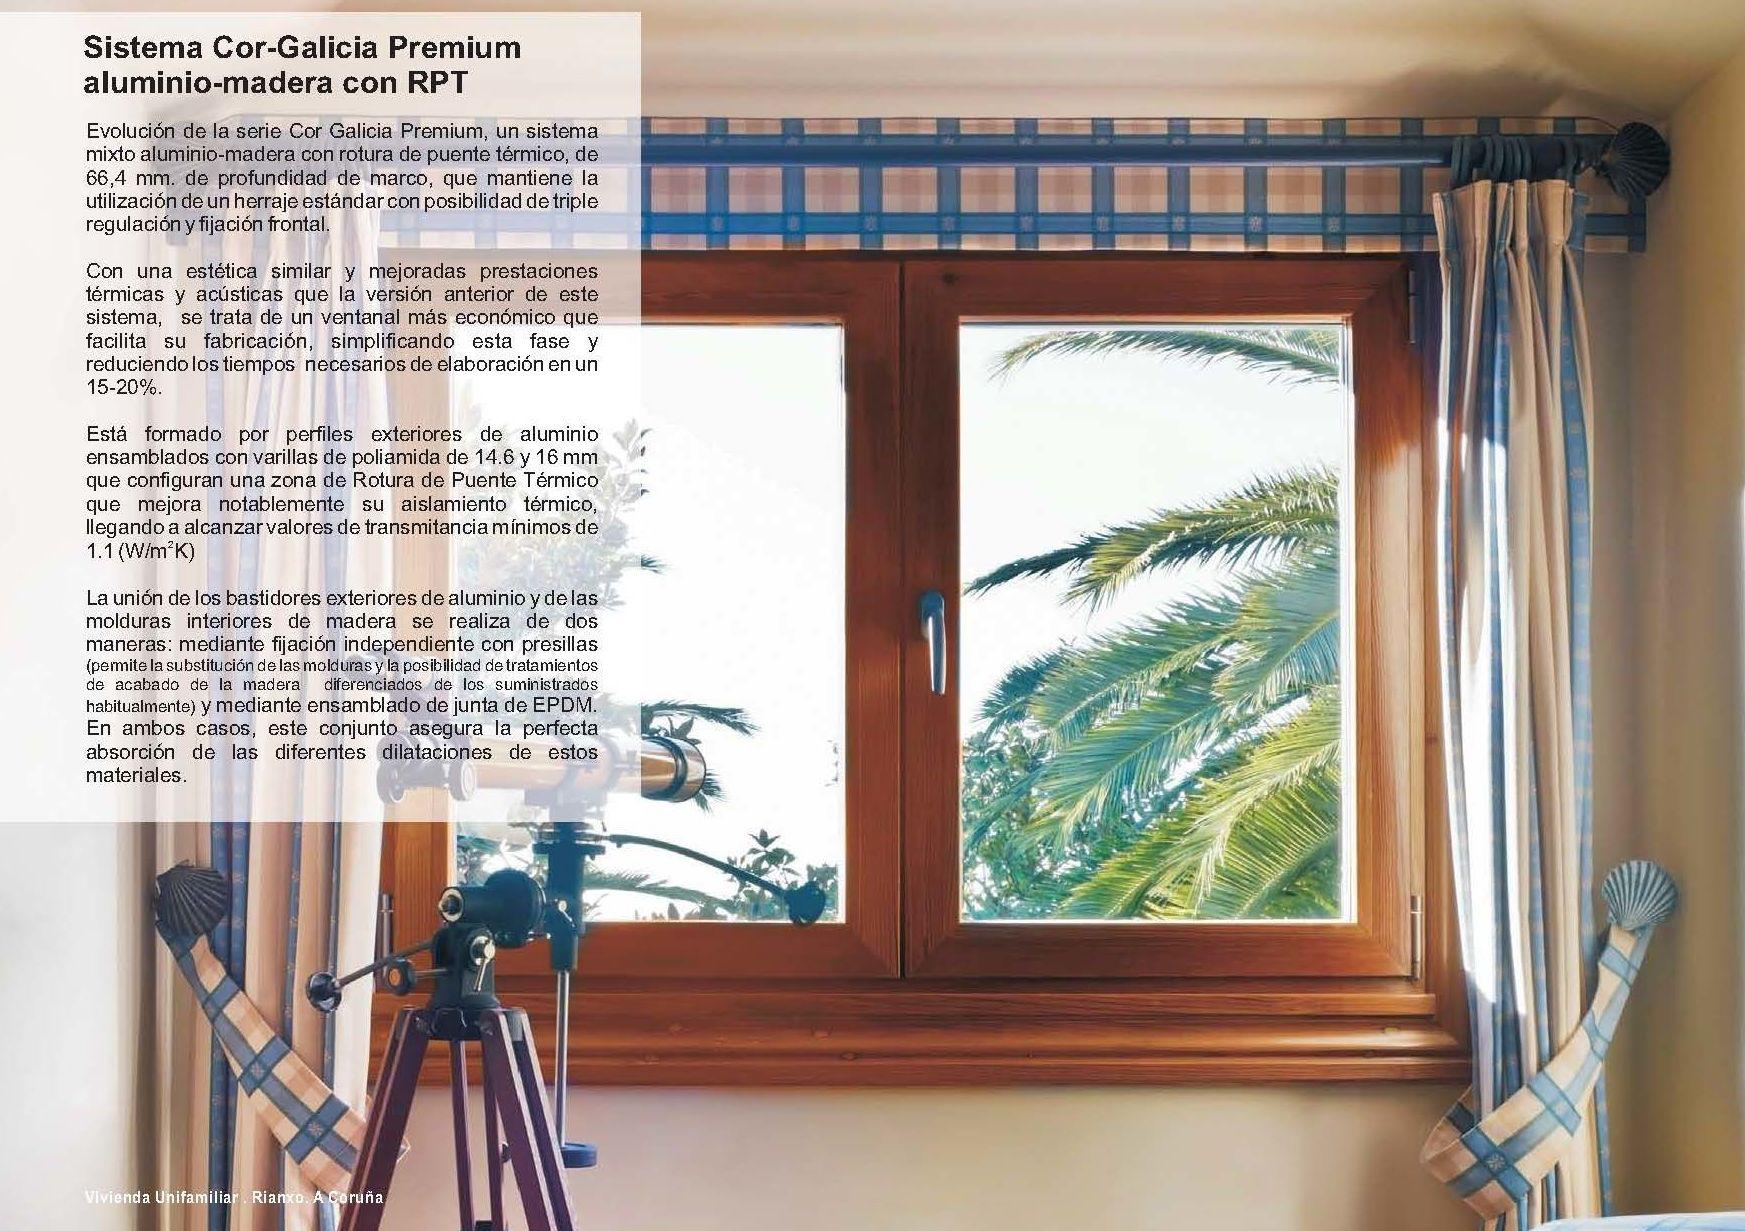 Cor Galicia Premium Alum-madera RPT: Catálogo de Jgmaluminio